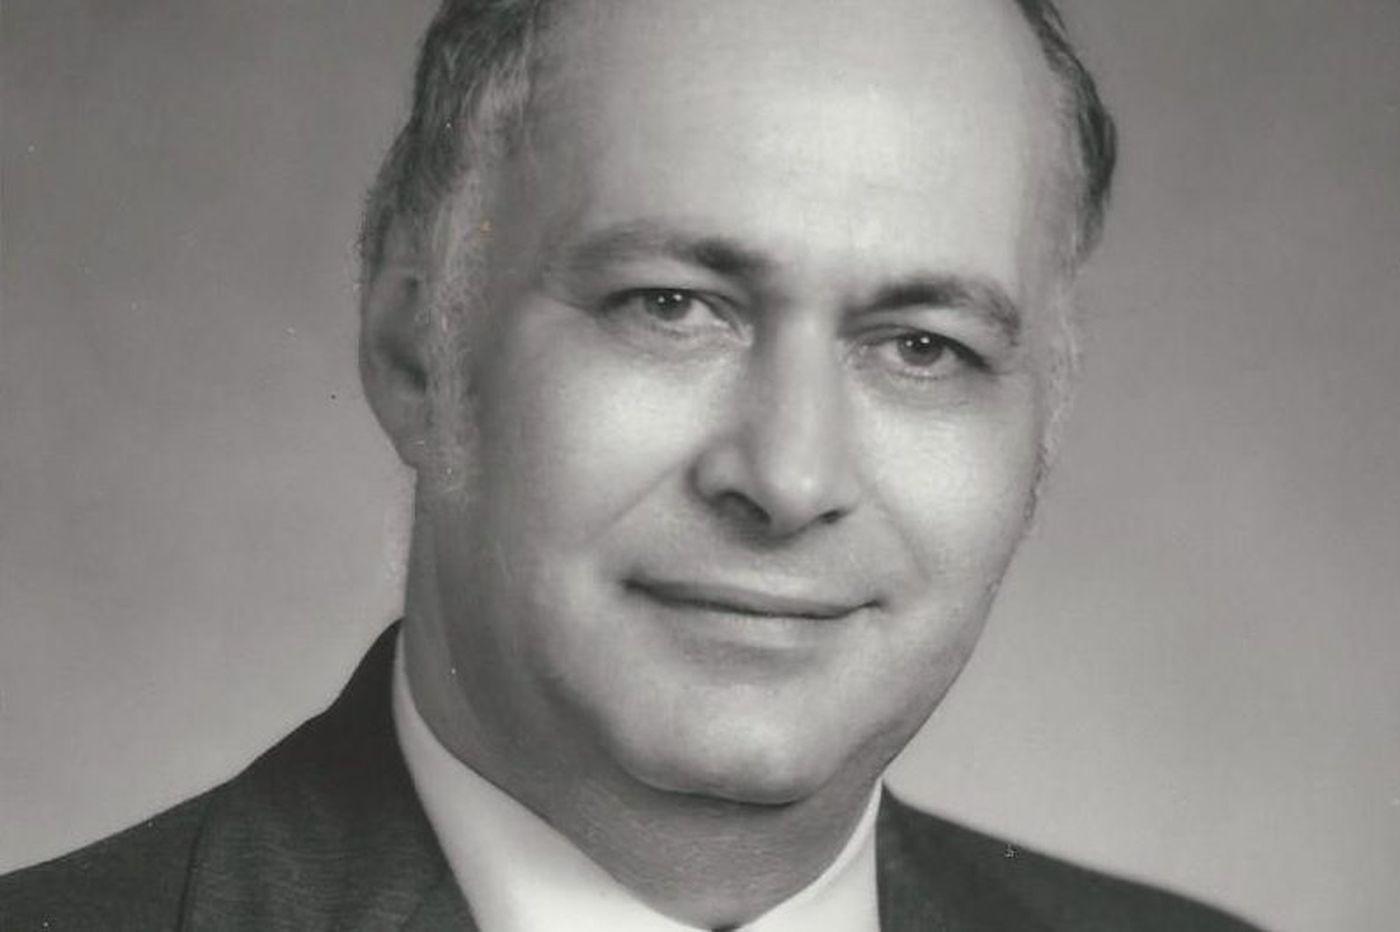 David N. Savitt, former trial lawyer, Pa. state legislator, and Common Pleas Court judge